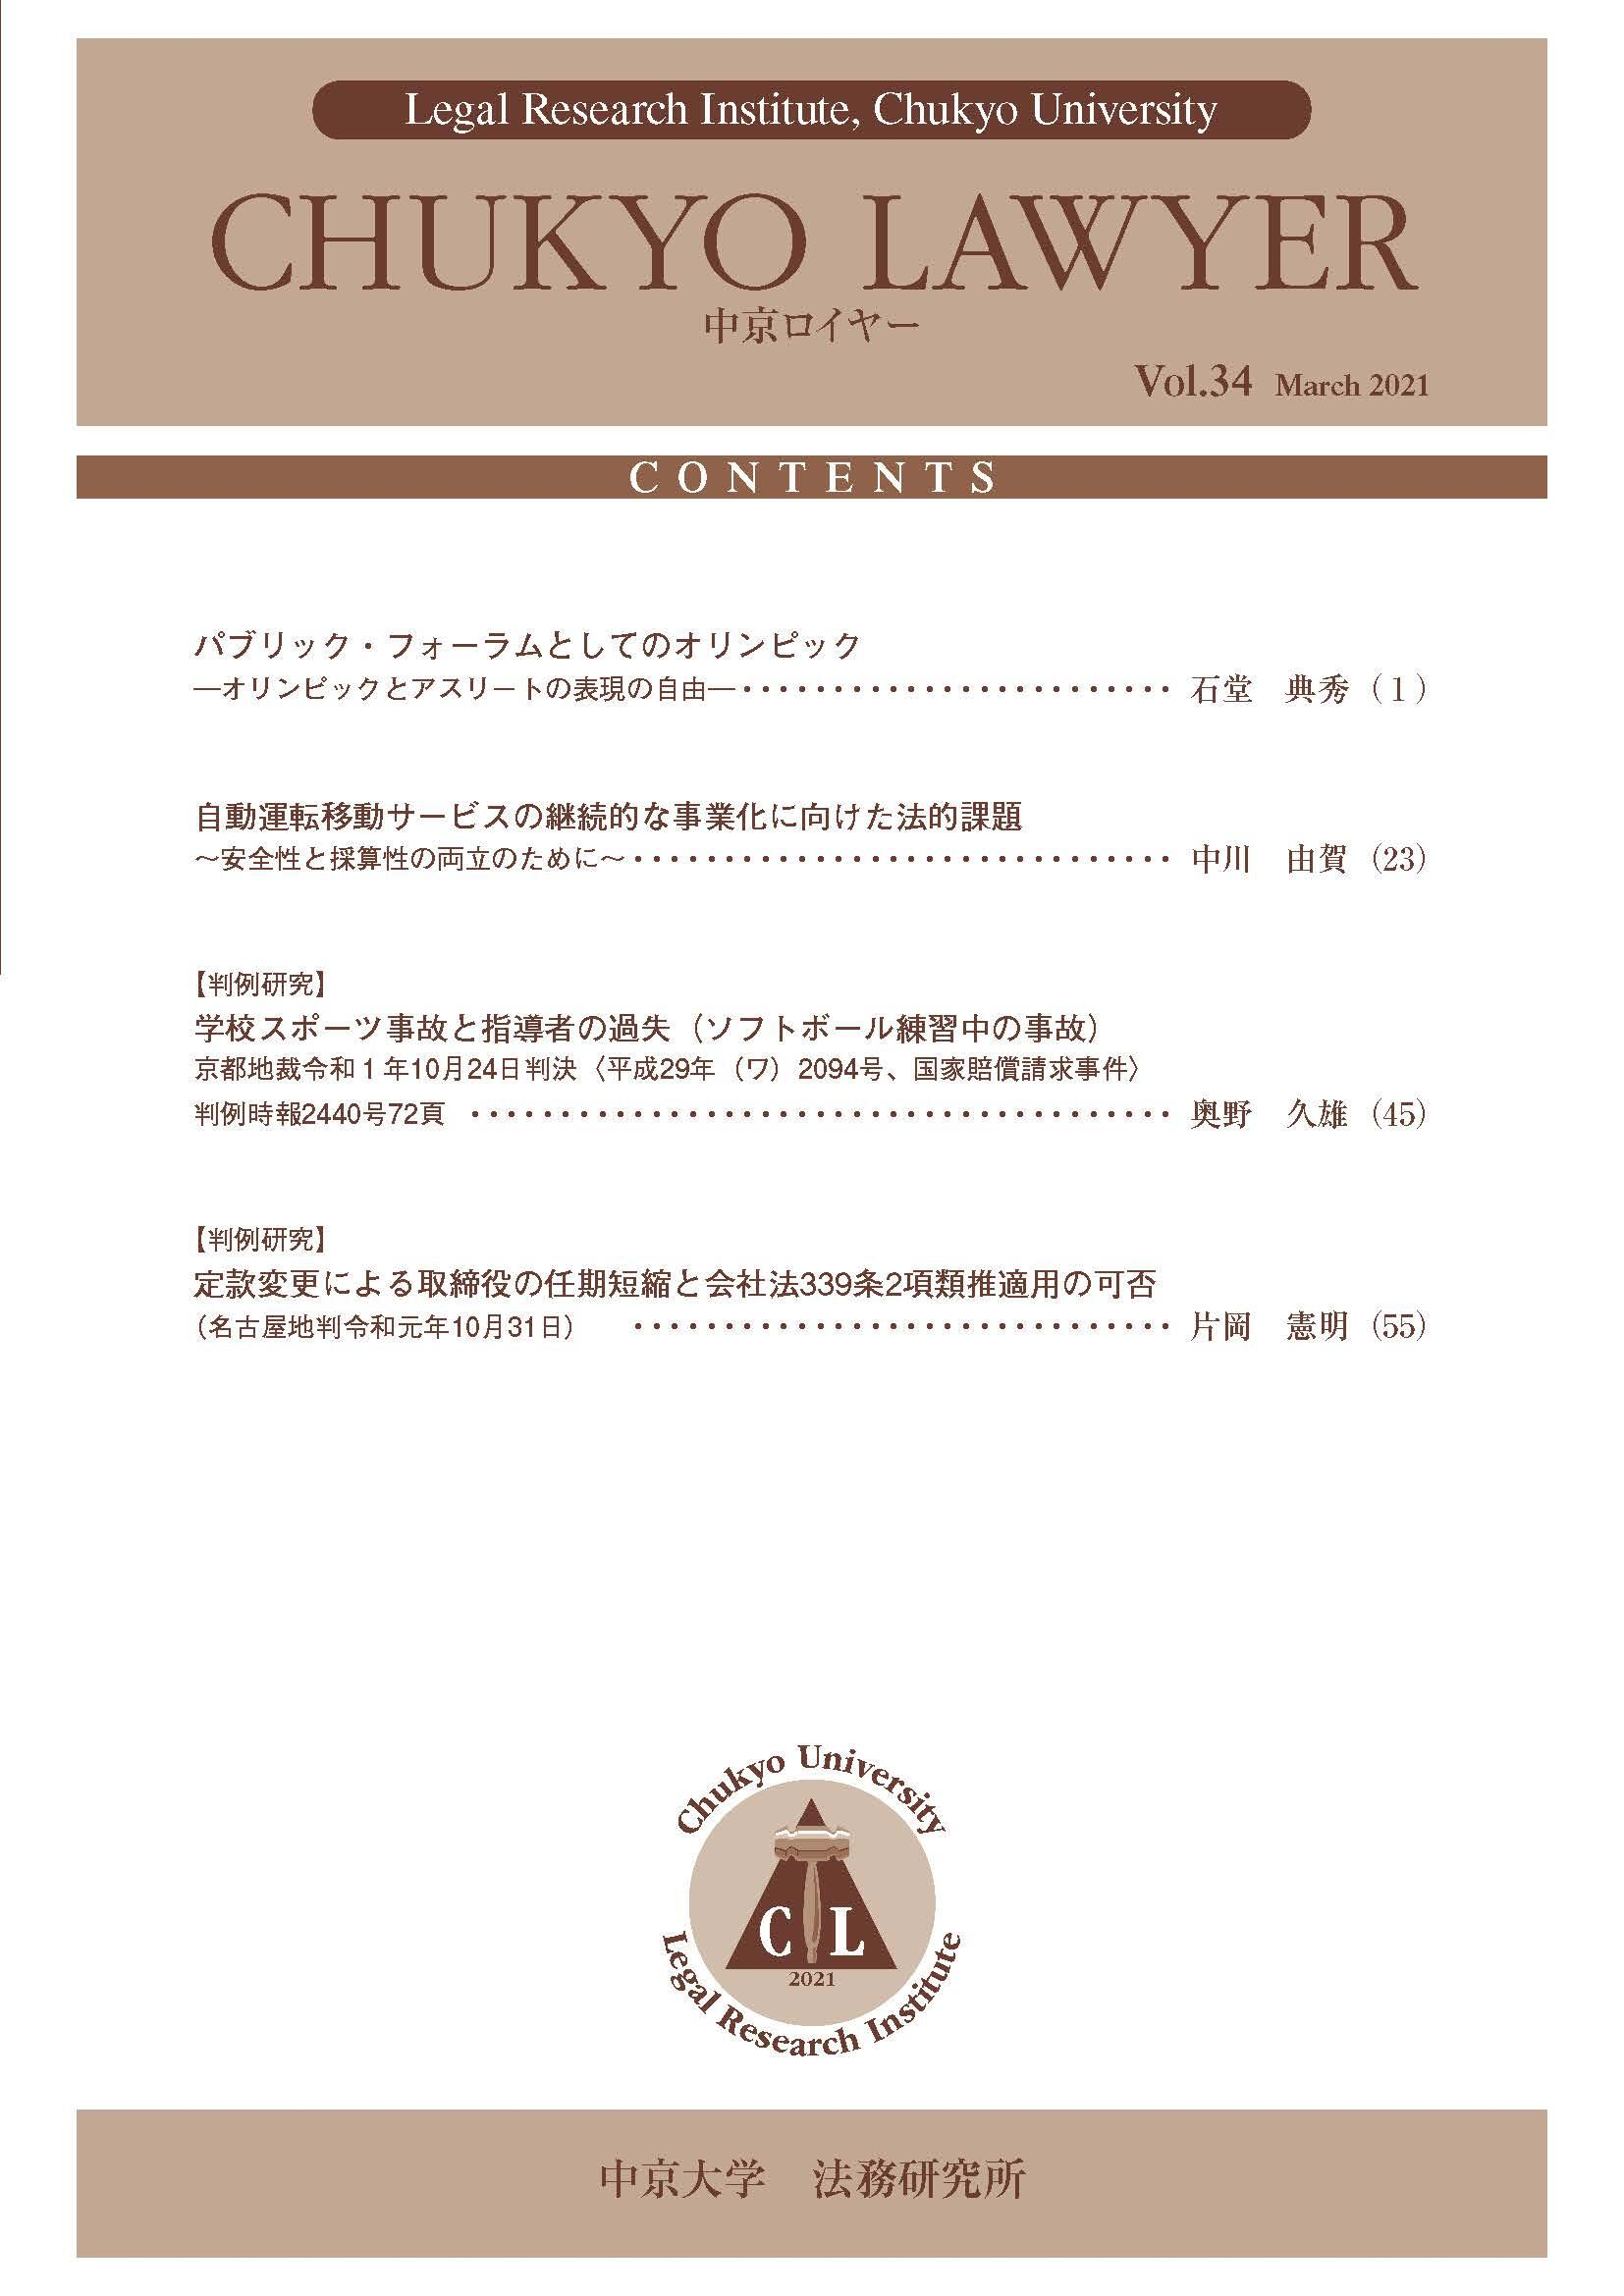 CHUKYO LAWYER Vol.34